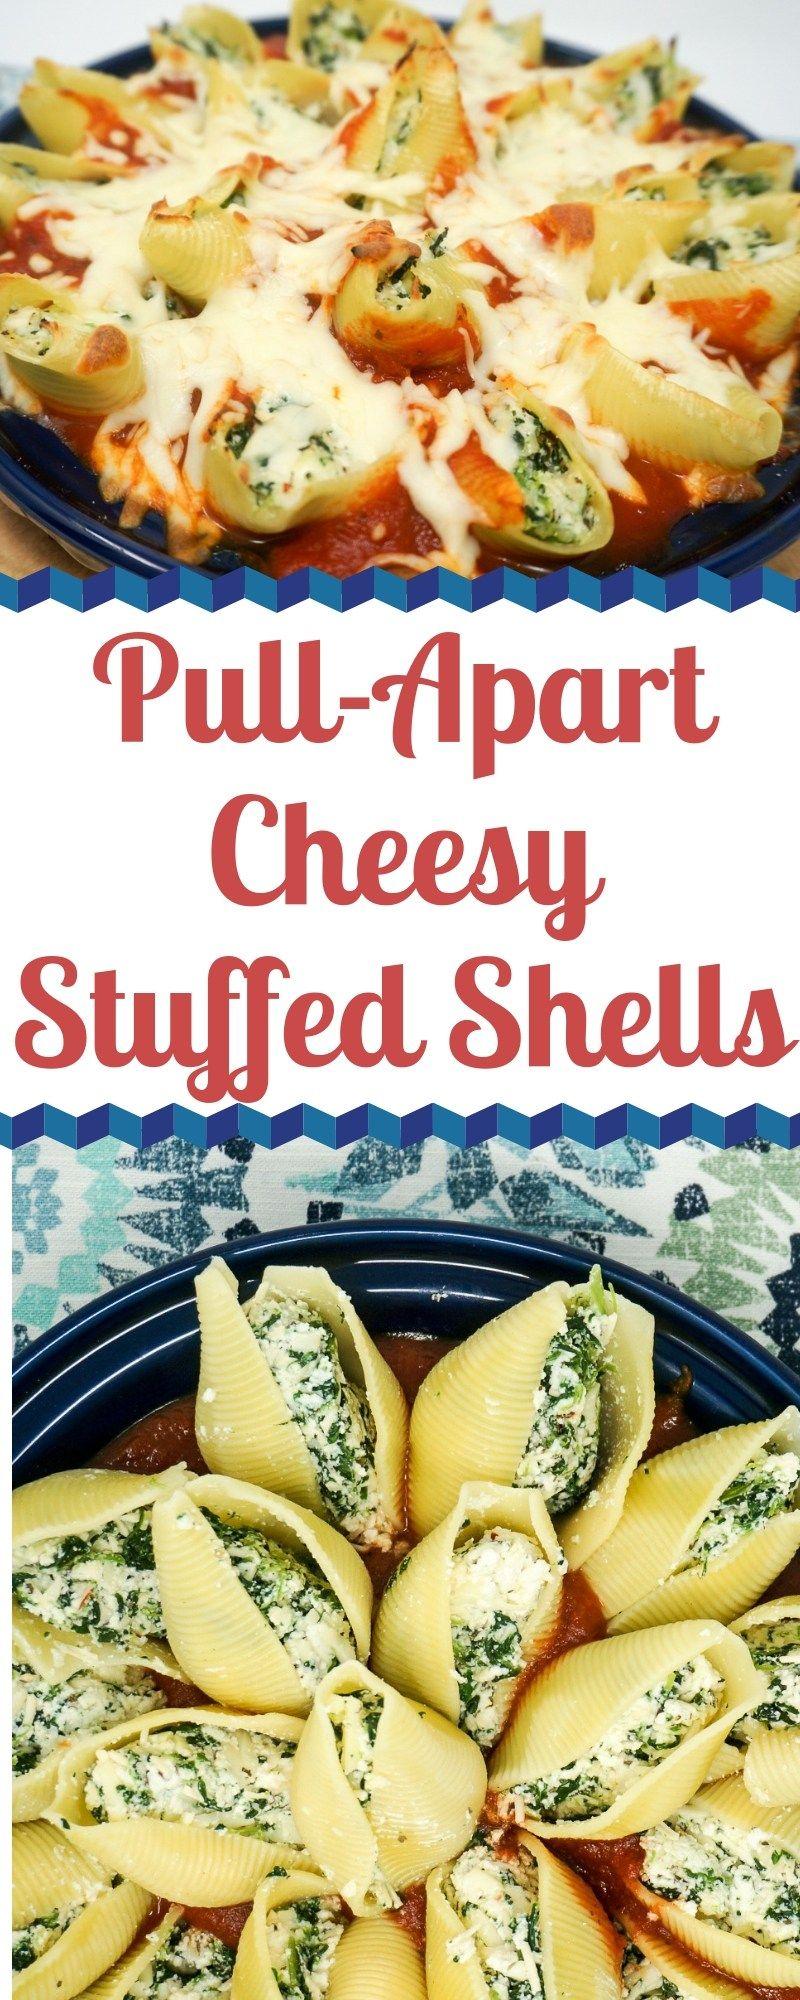 Photo of Pull-Apart Cheesy Stuffed Shells